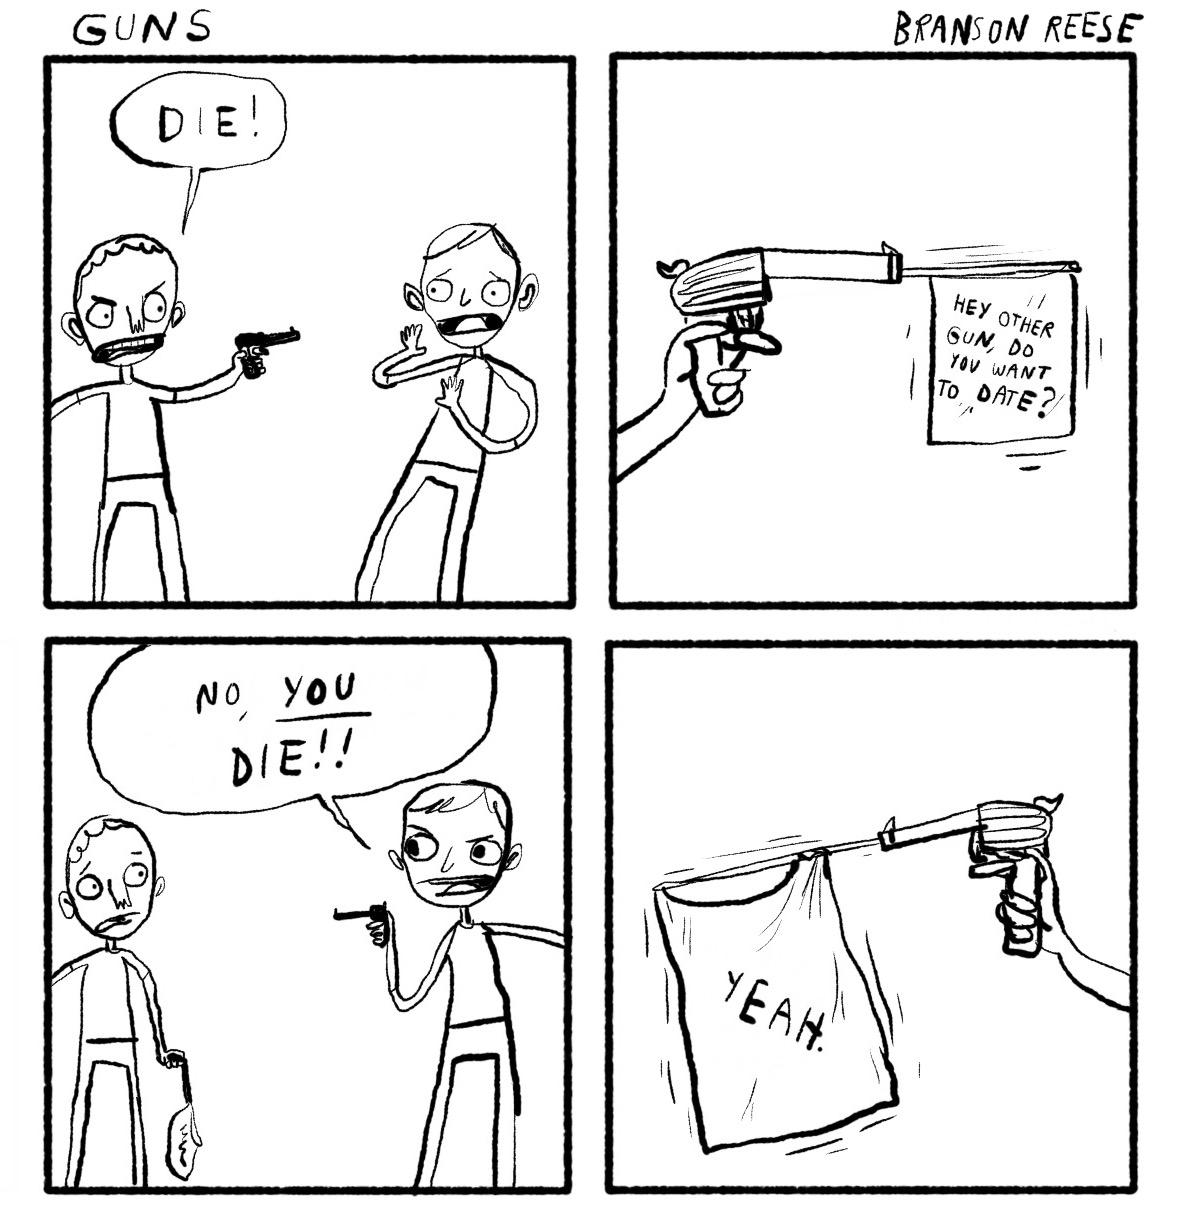 0152 guns2.jpg